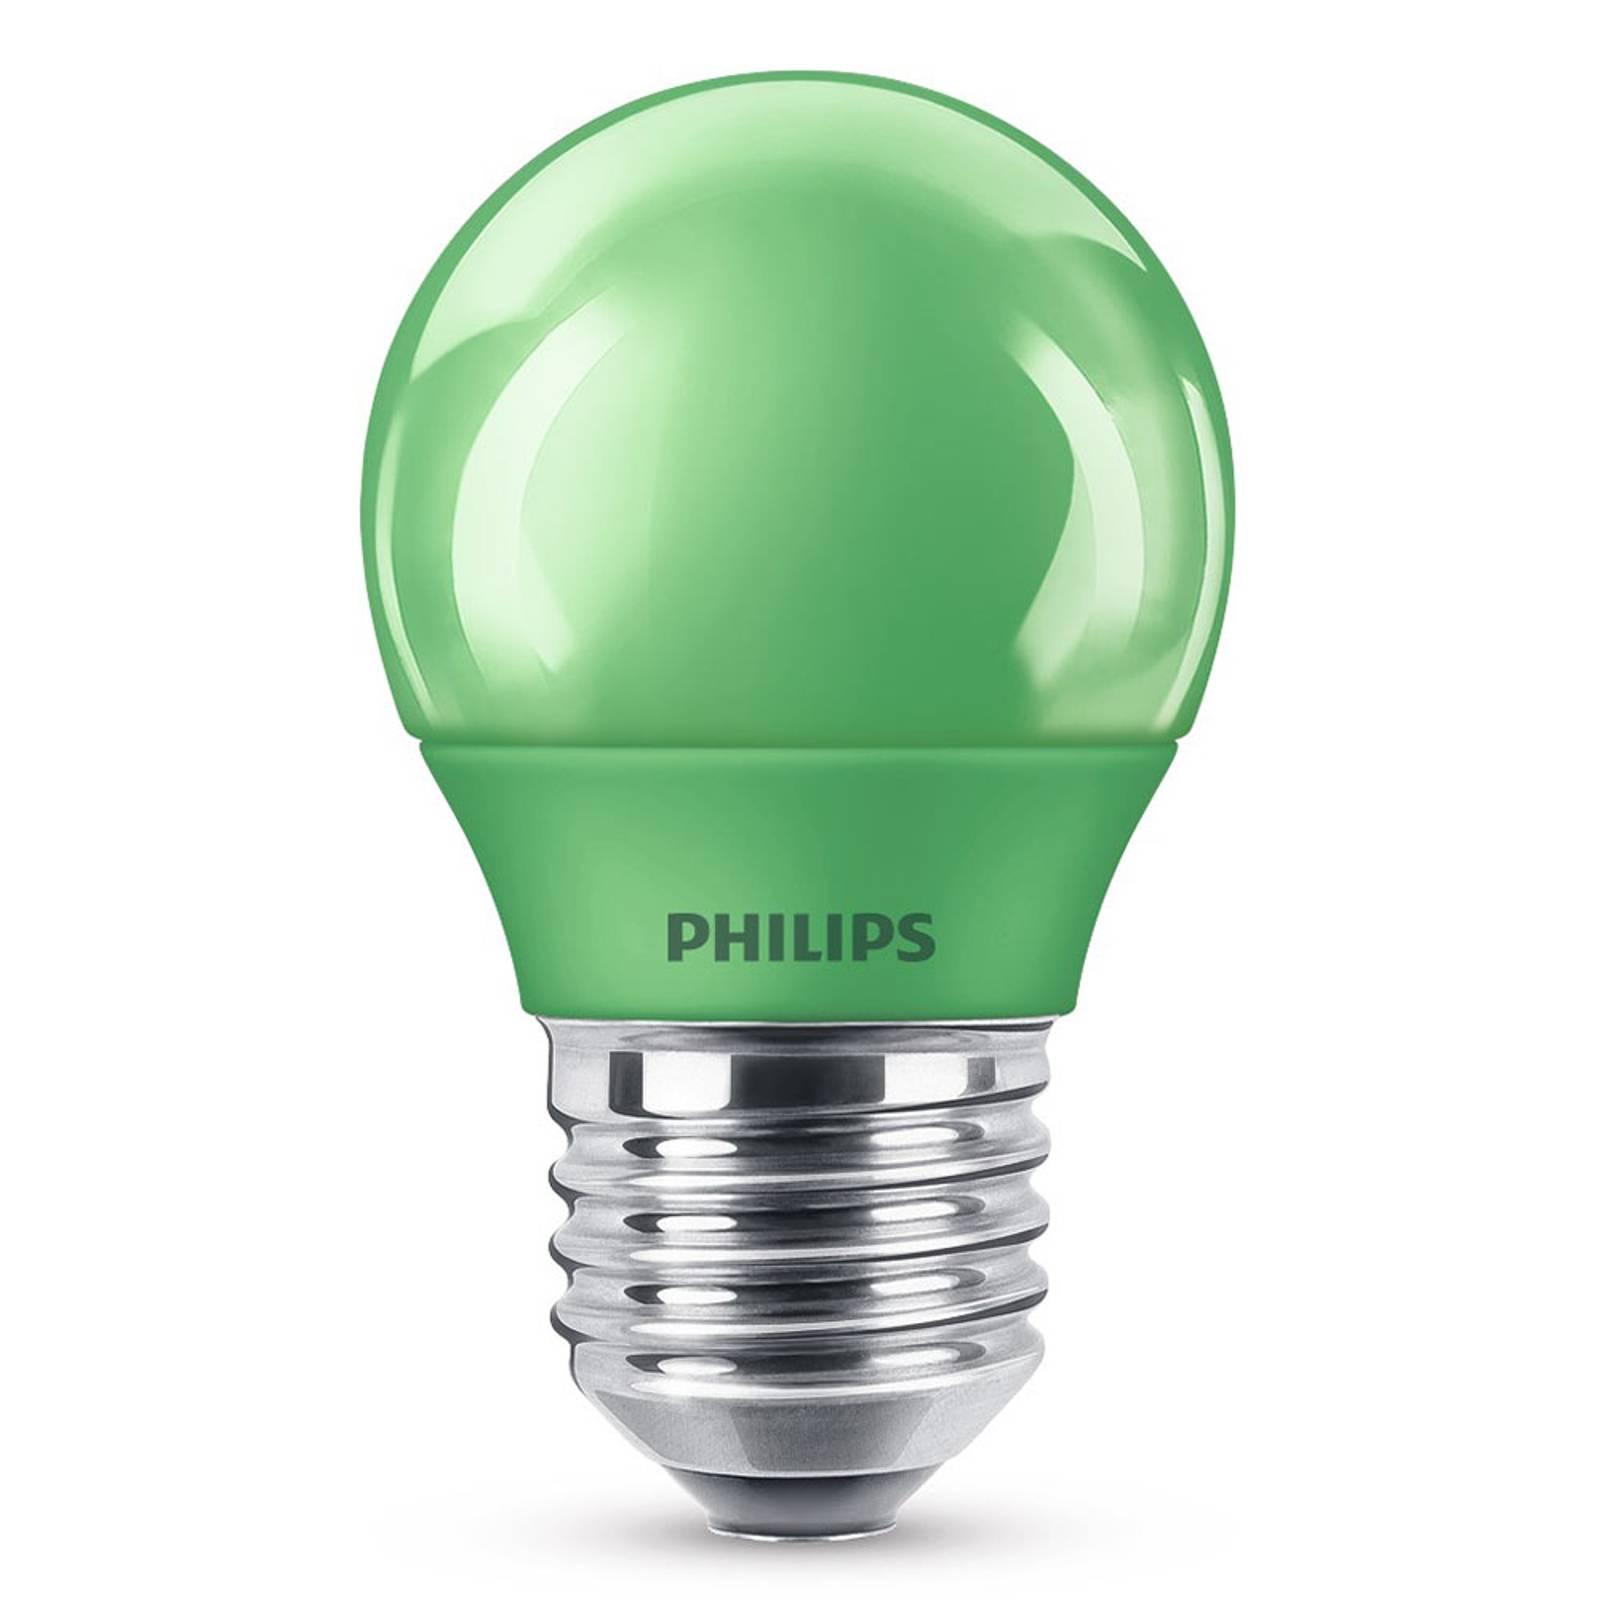 E27 P45 -LED-lamppu 3,1 W, vihreä